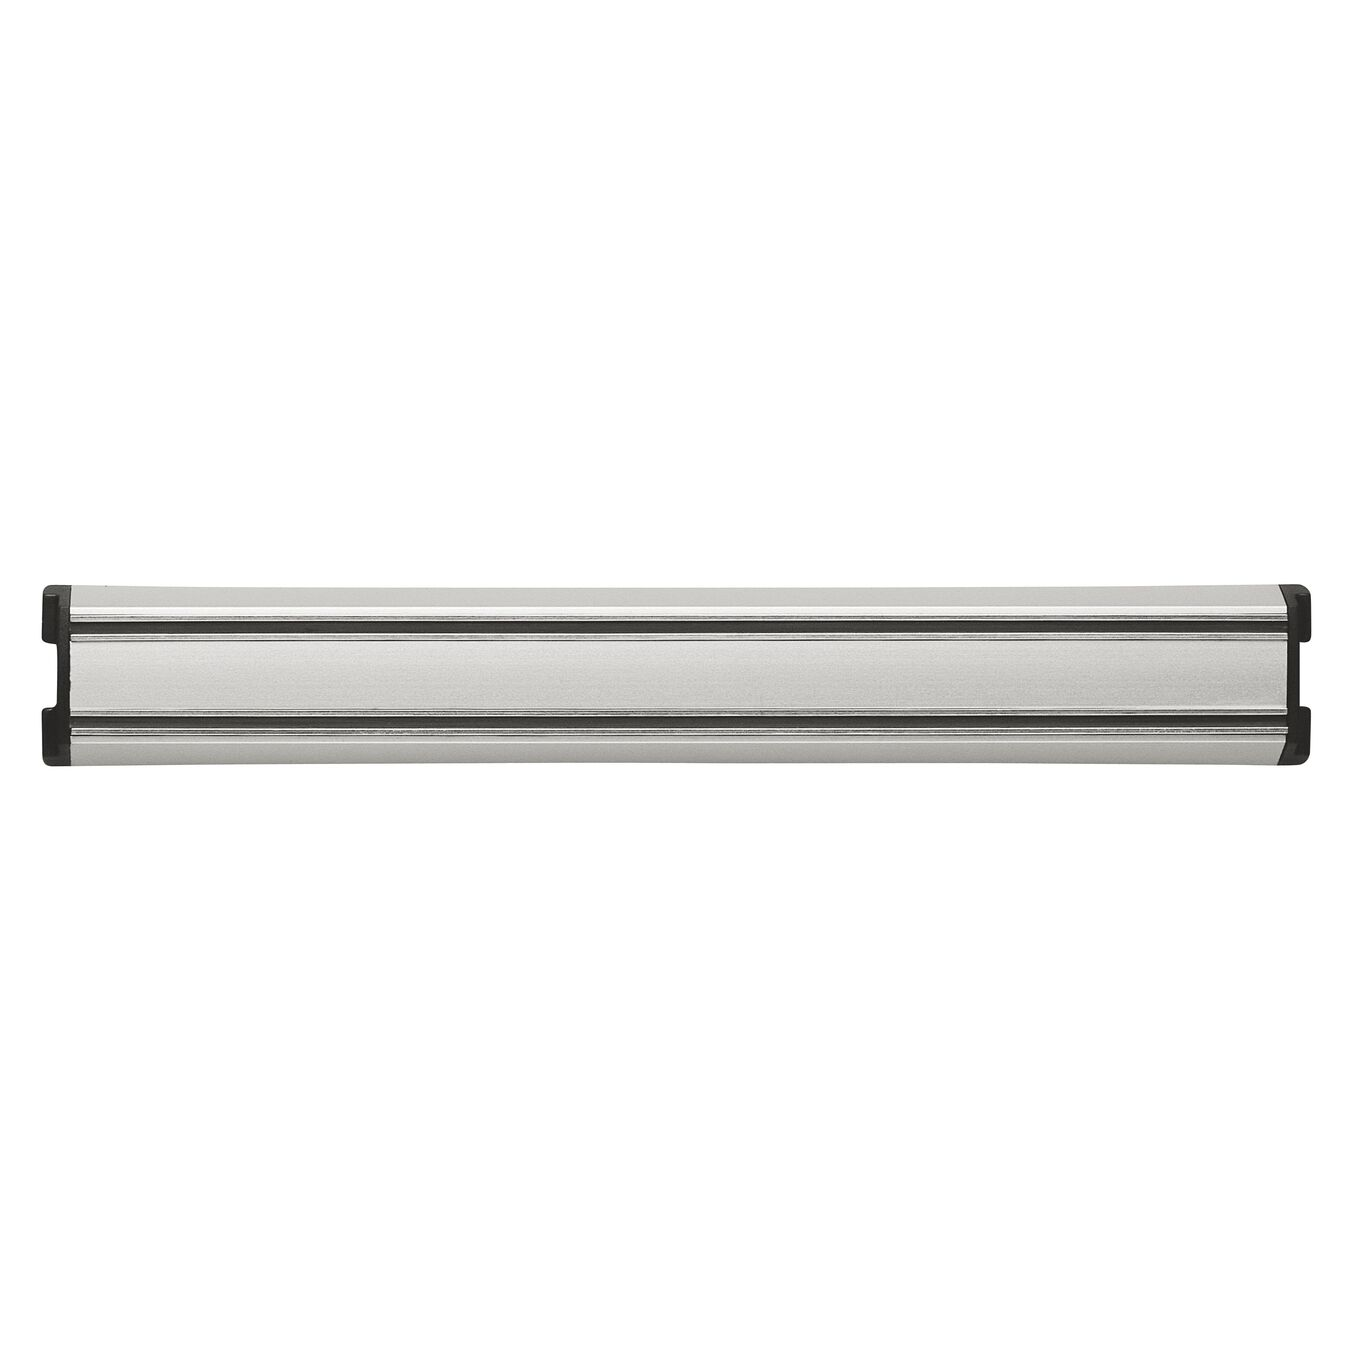 Magnetic knife bar 30 cm aluminium,,large 1